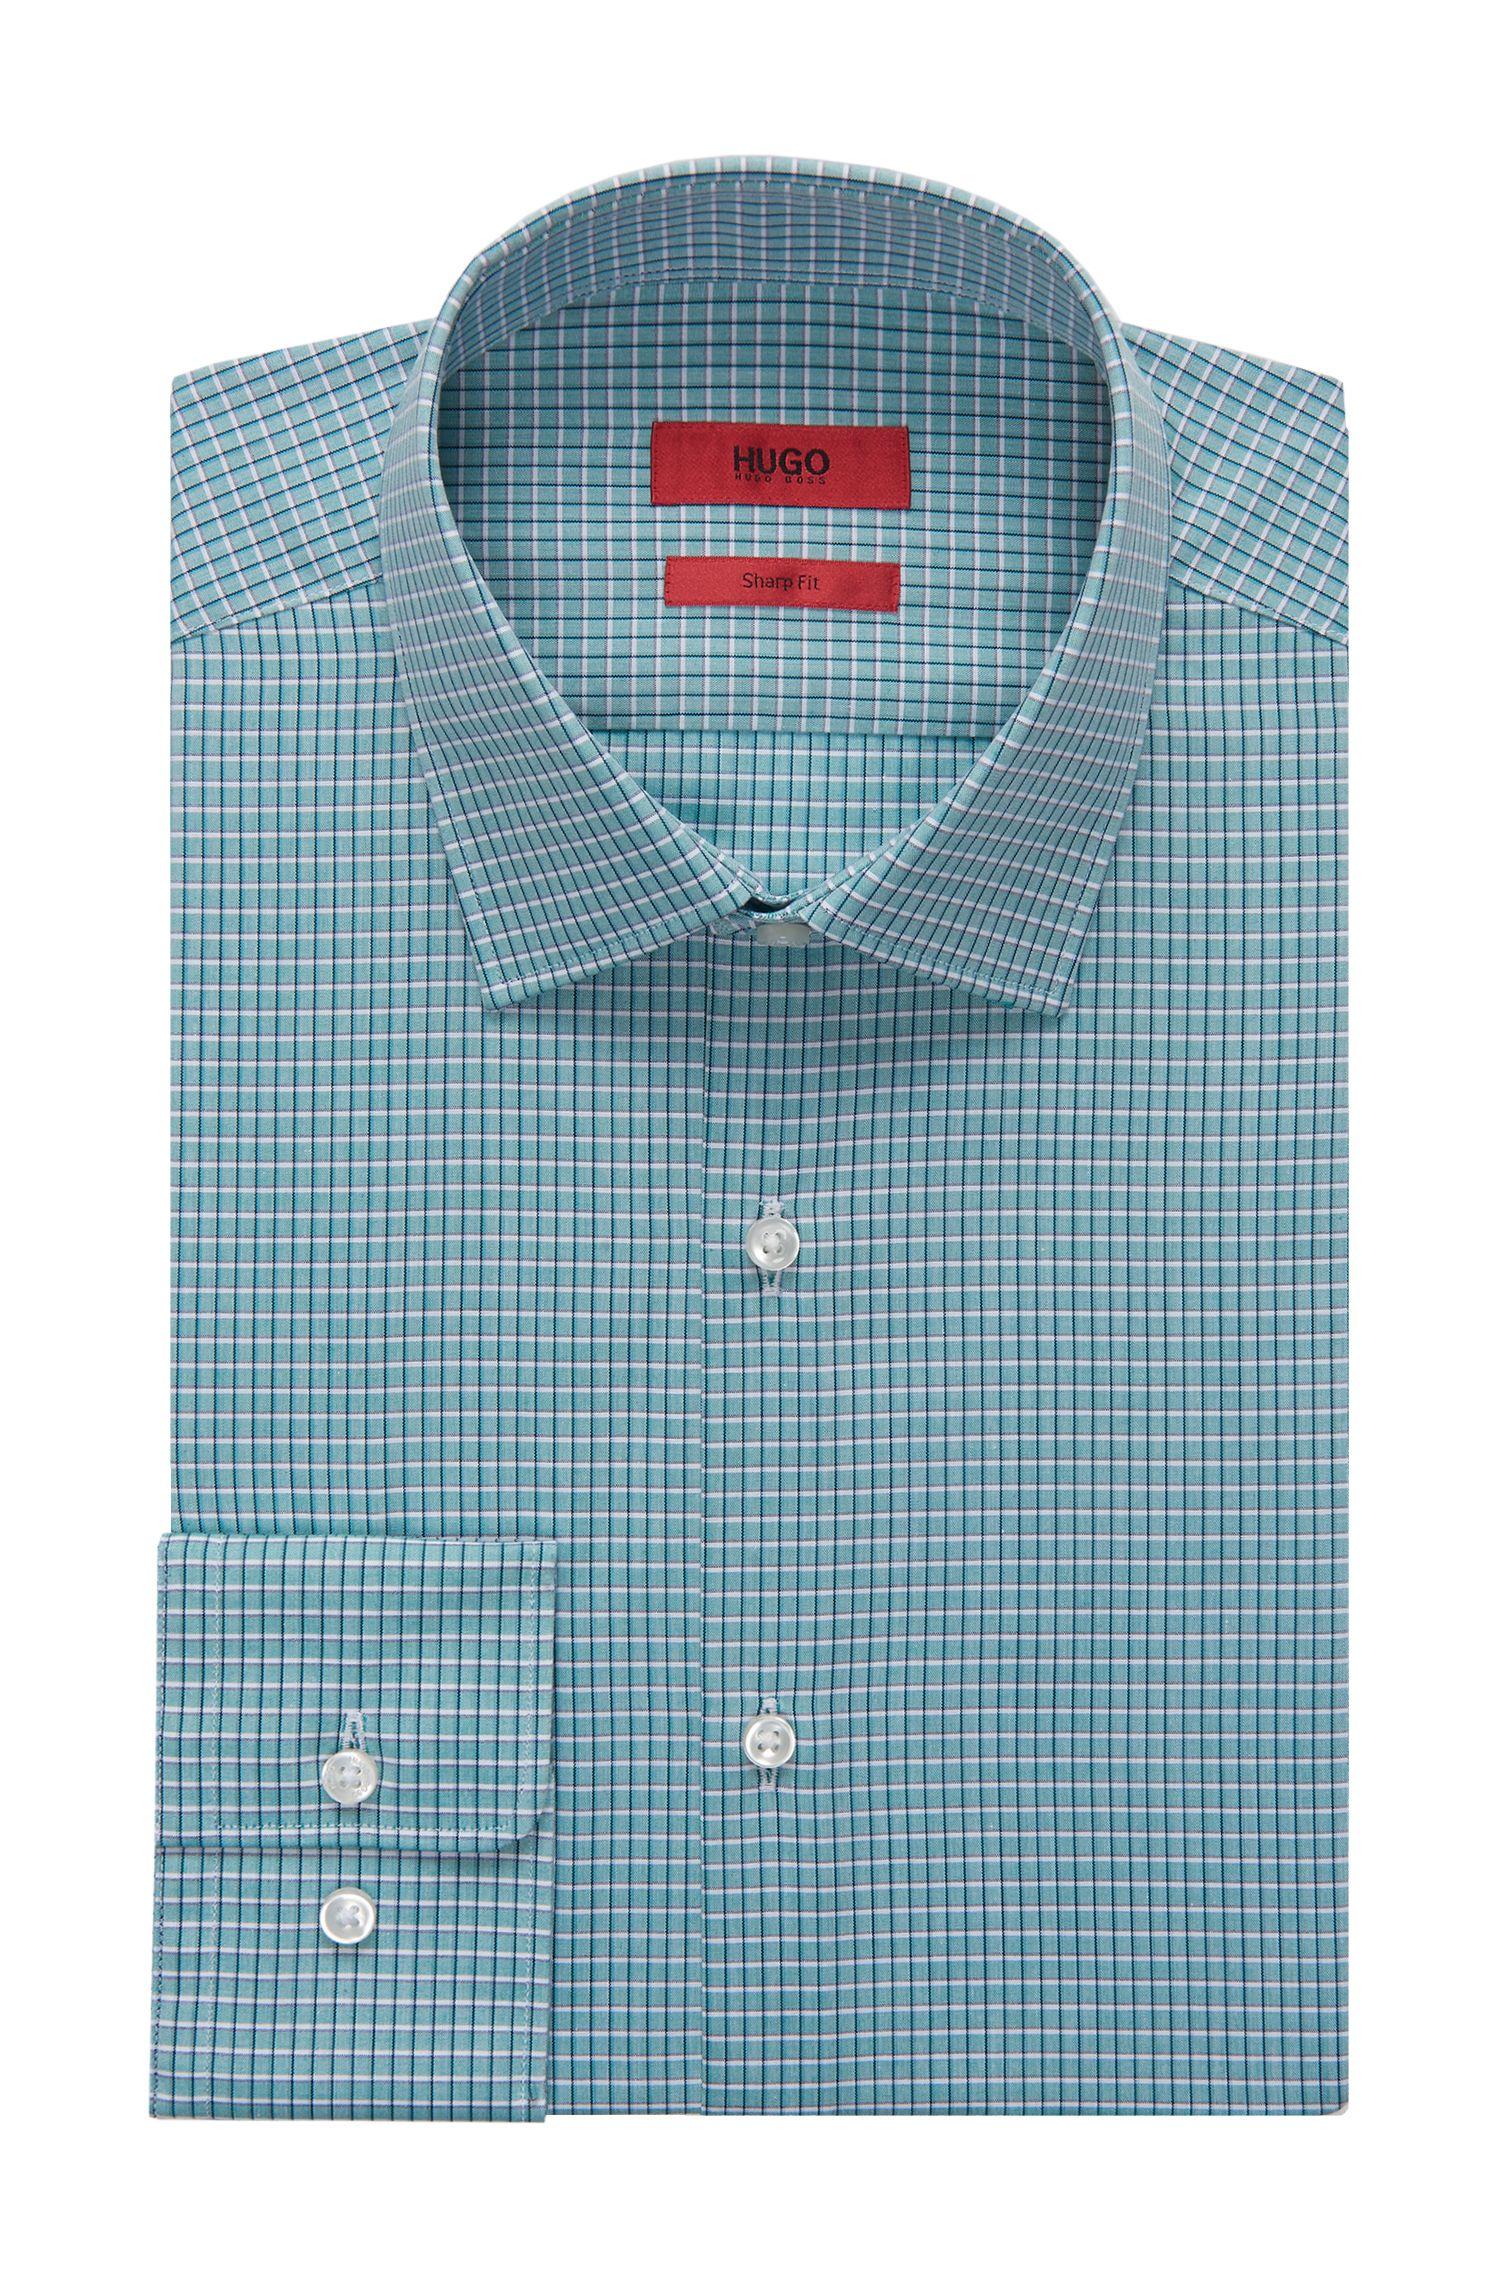 Checked Dress Shirt, Sharp Fit | C-Mabel